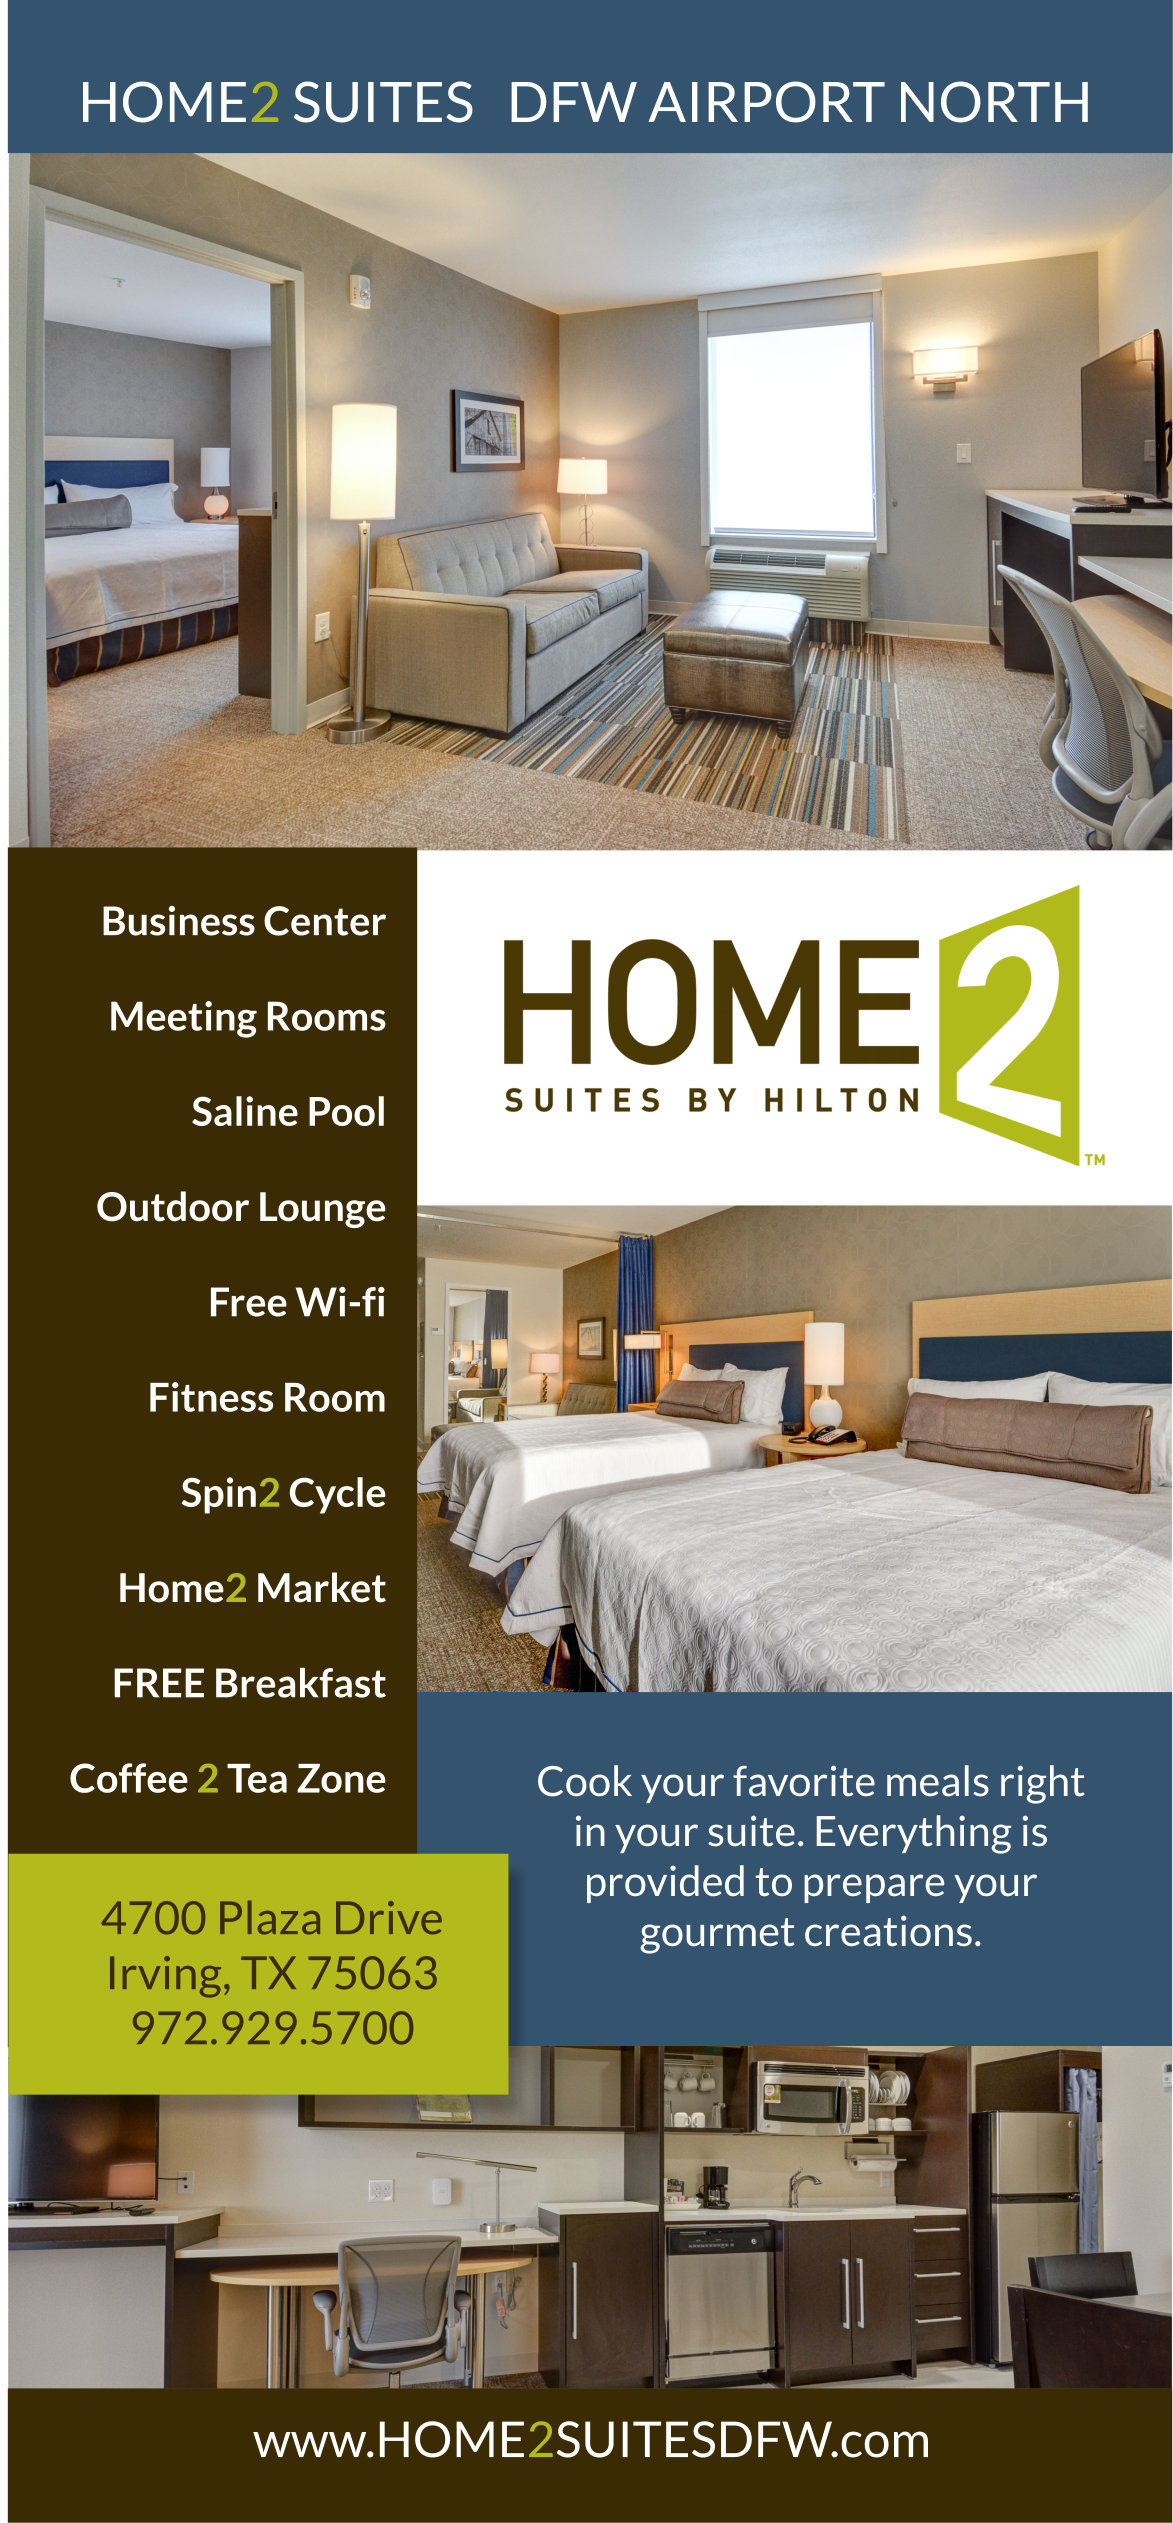 Hilton Hotel Rack Card - BIGlilFISH Divi Website Design with SEO